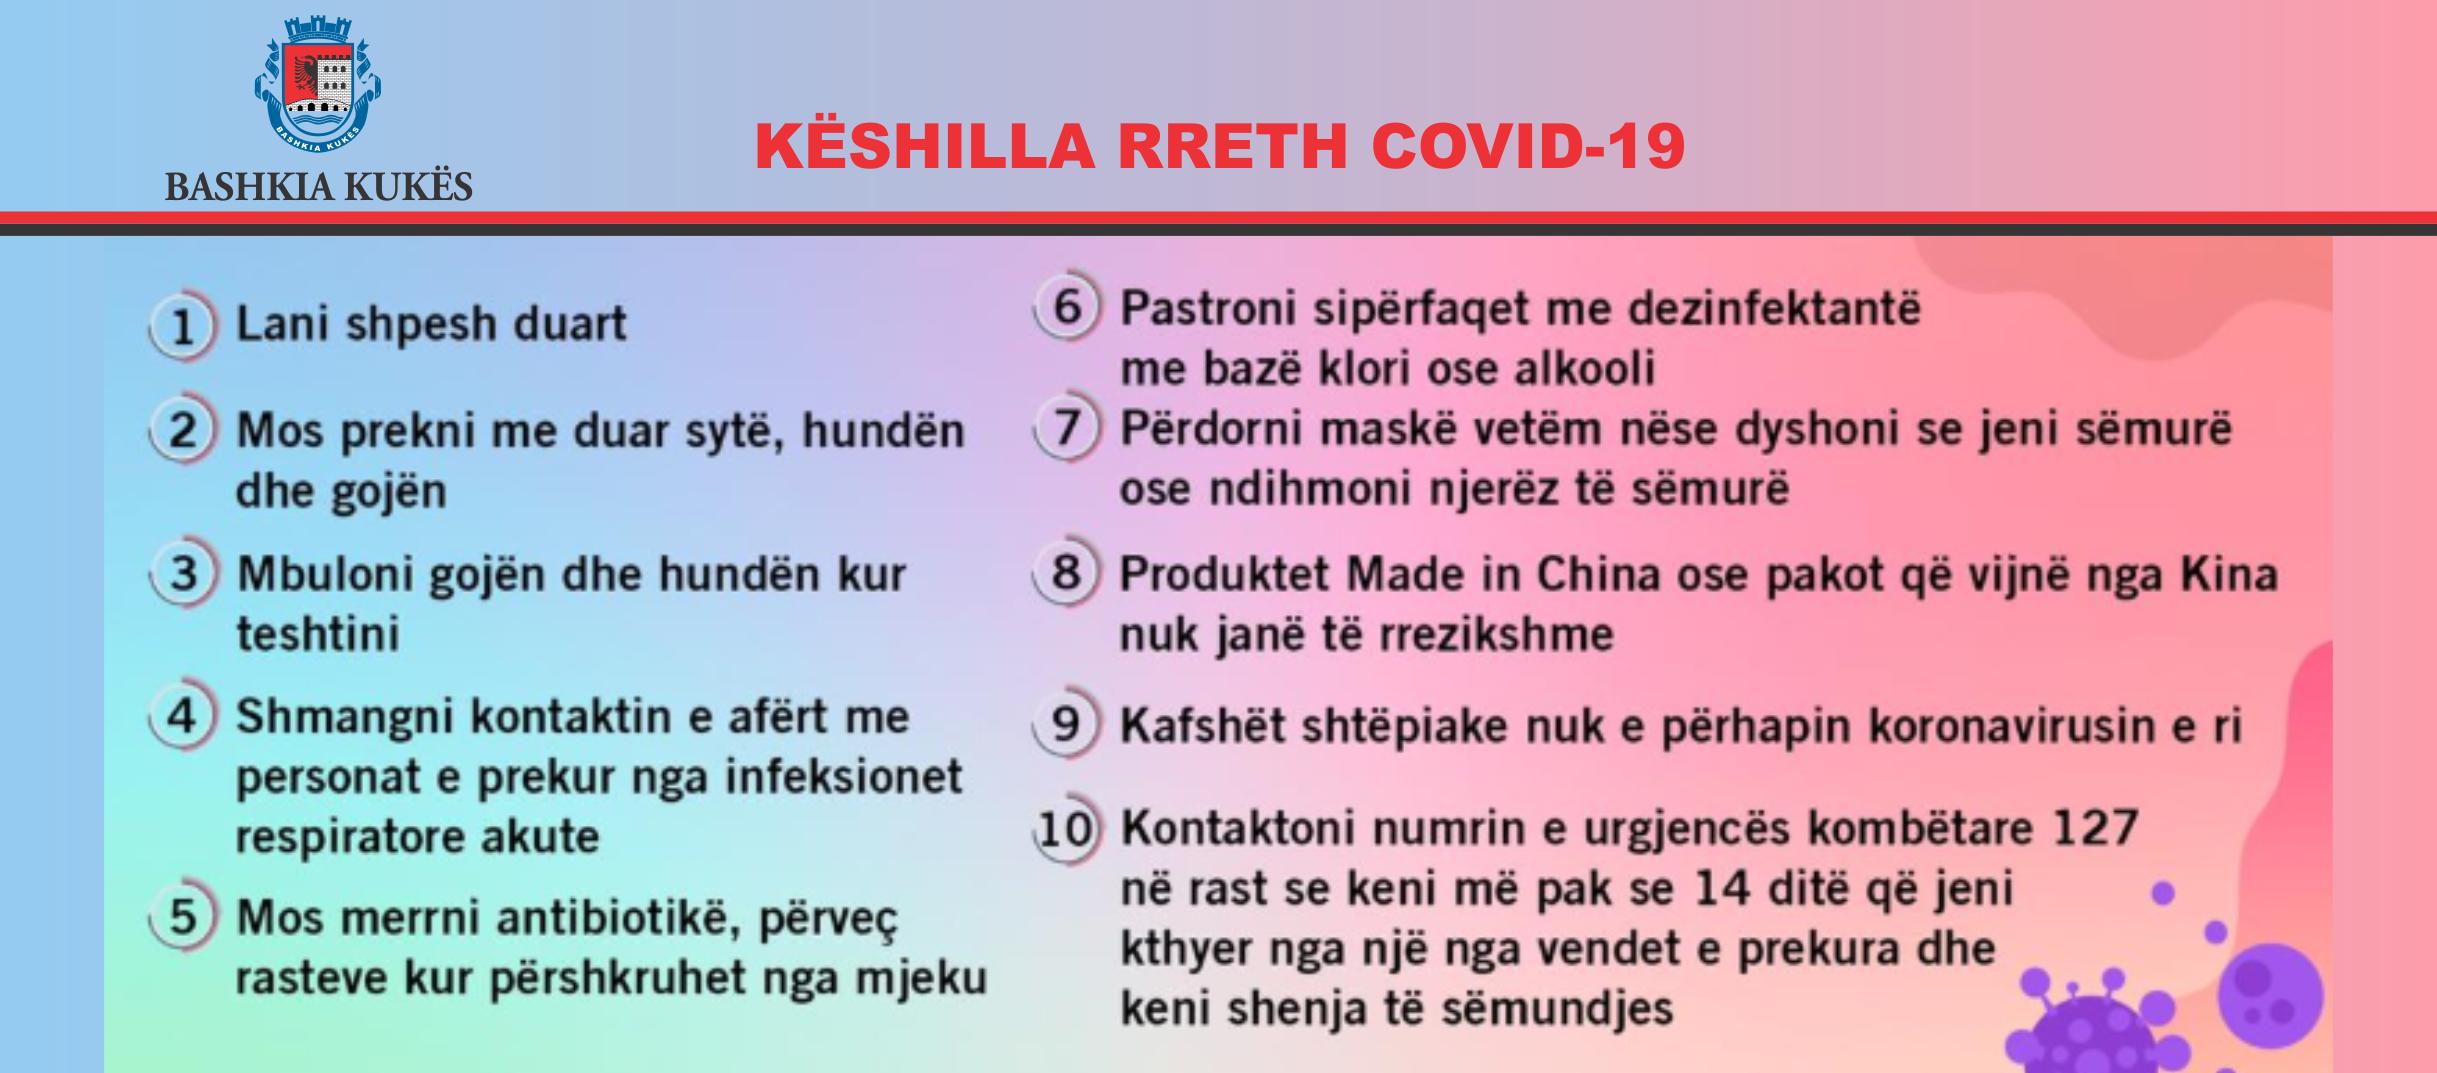 KESHILLA RRETH COVID-19